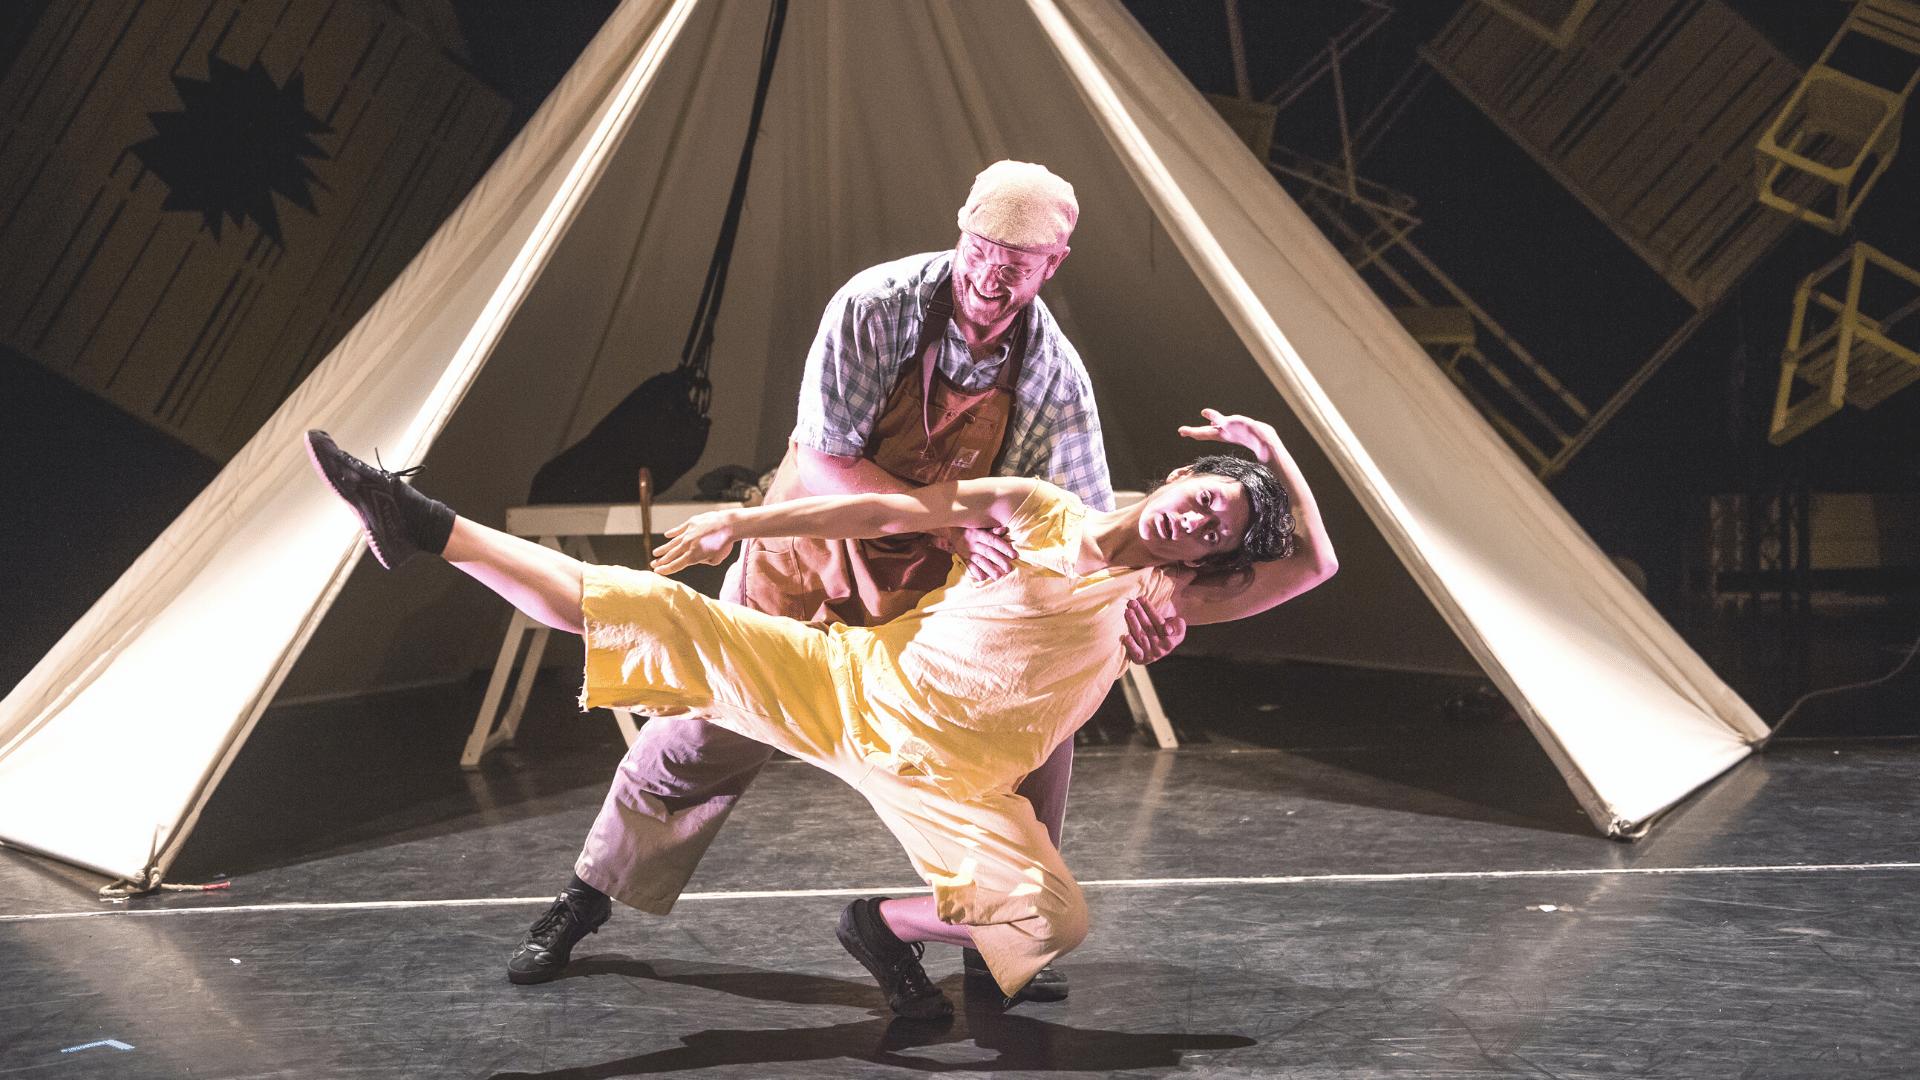 JVC' Pinocchio, featuring dancers Maria Doulgeri and David Lloyd